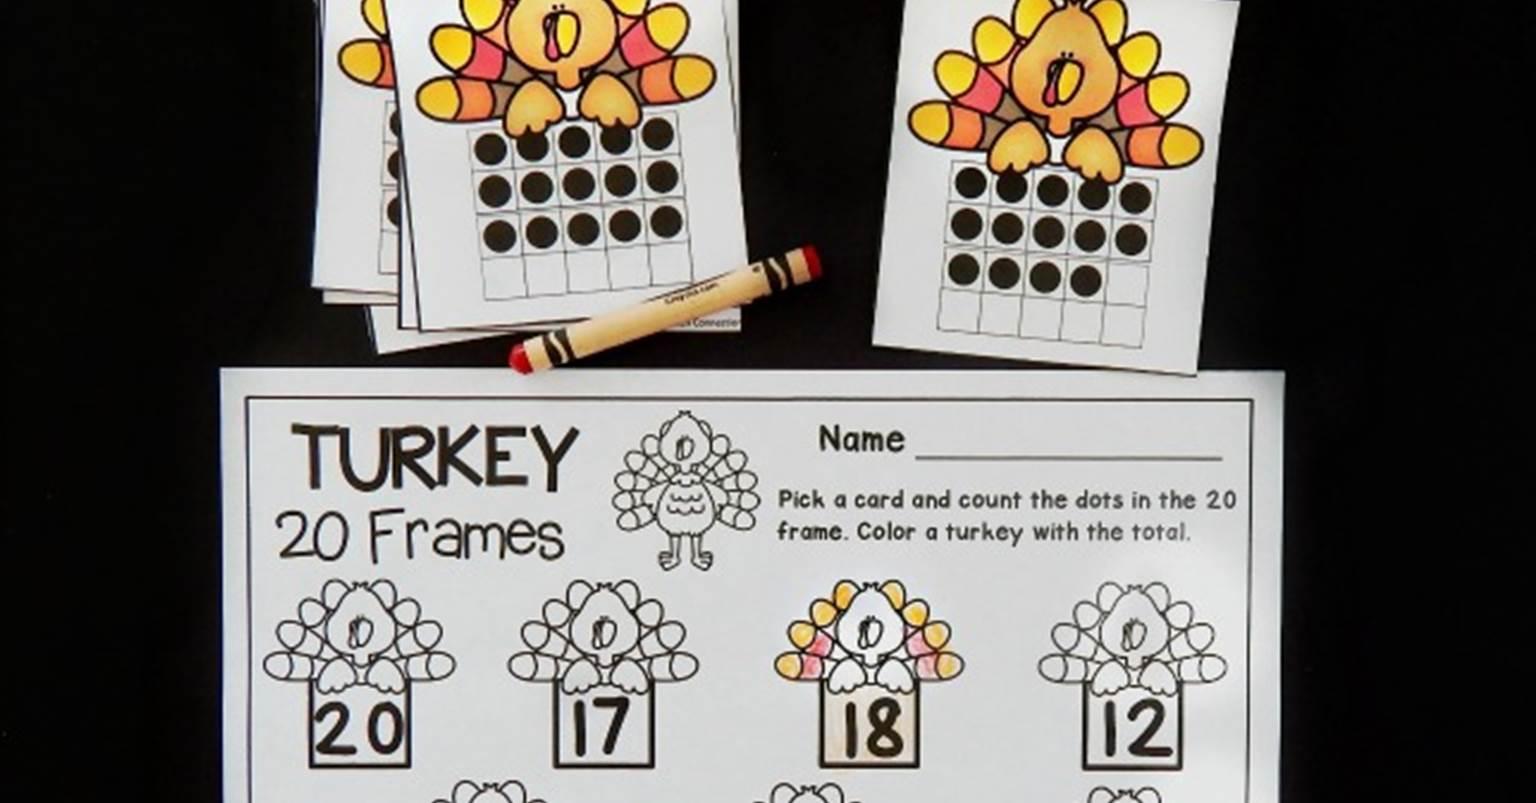 Turkey 20 Frames Math Game